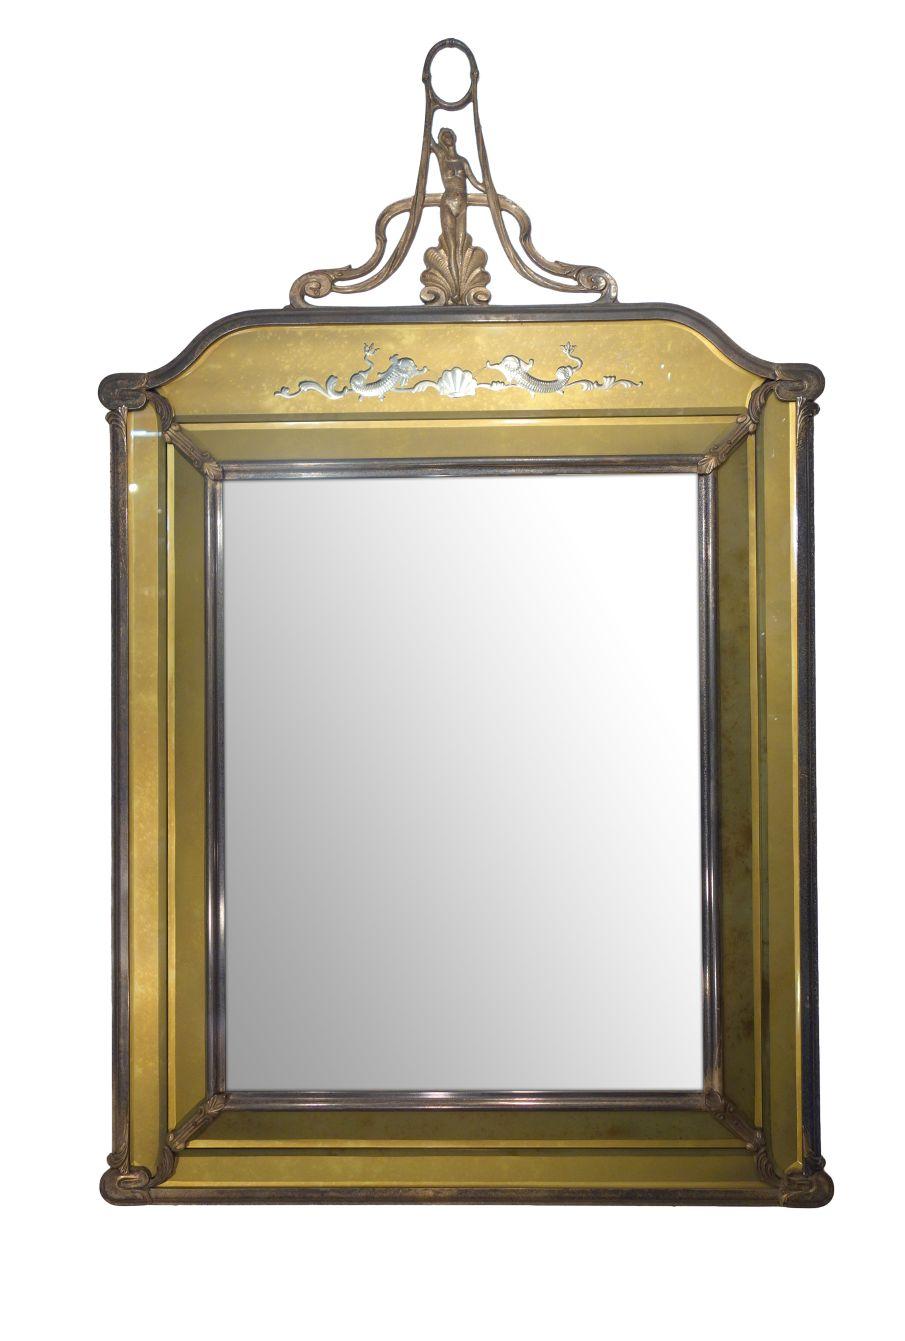 19th Century Antique Italian Nouveau Liberty Style Facet Engraved Metal Mirror Ca 1890